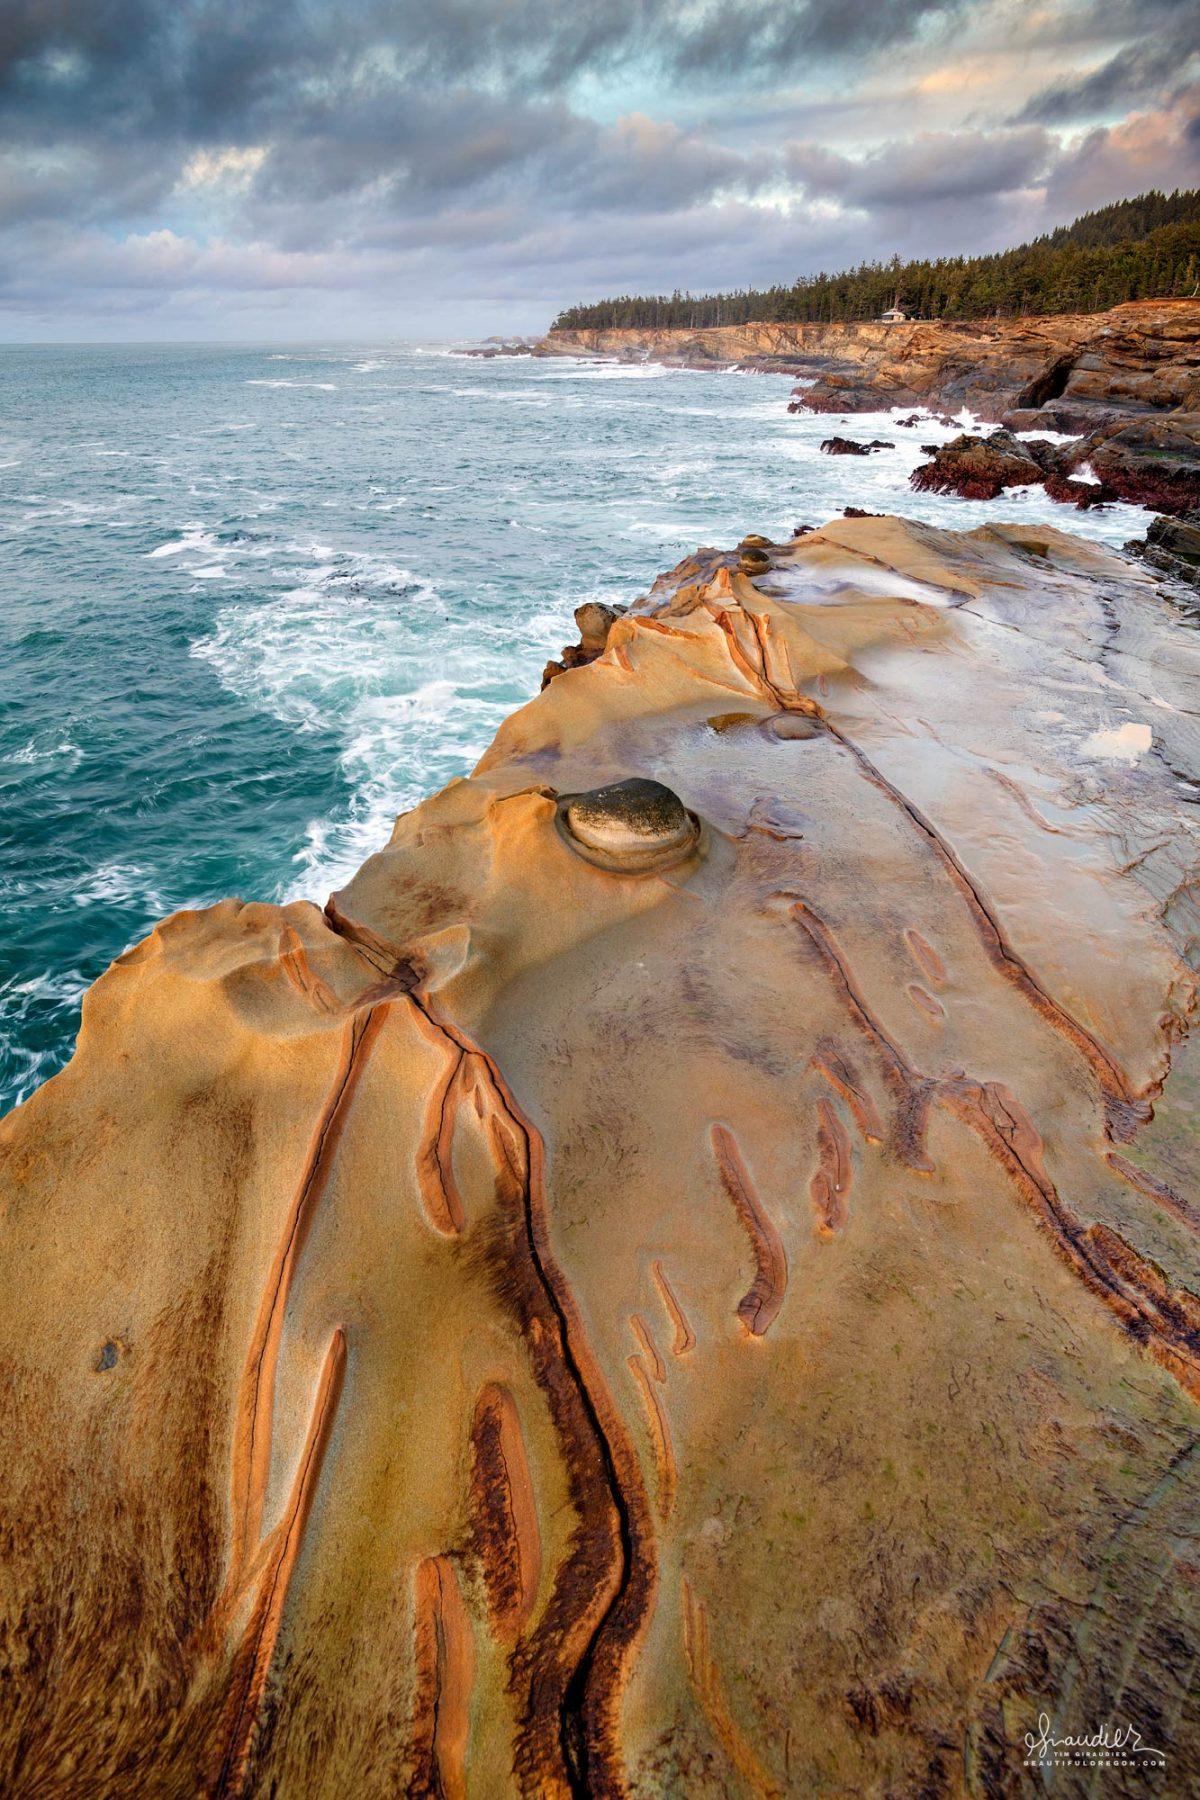 Sunset Bay State Park, with headlands of colorful sedimentary rock and eroding concretion. Shore Acres, Cape Arago, Oregon Coast.